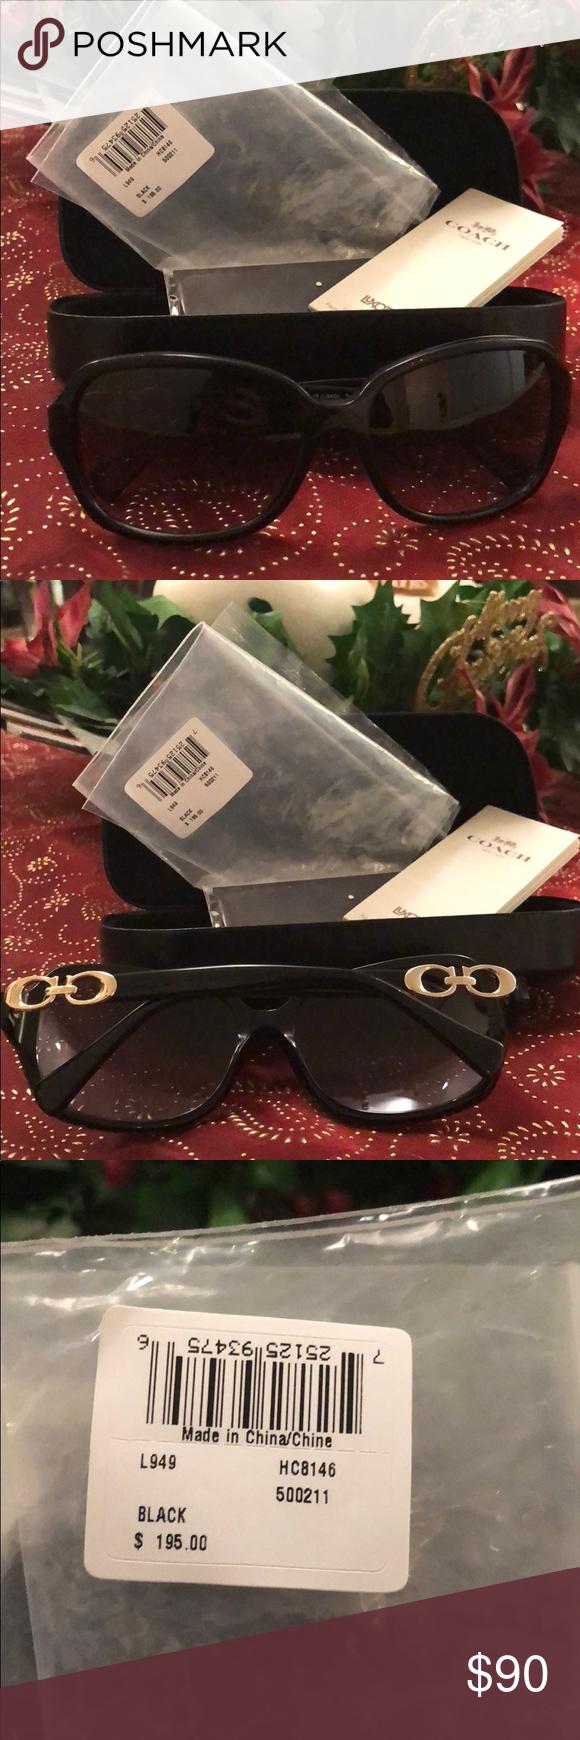 27297316c1 ... hot coach sunglasses black new one side make ann offer coach  accessories sunglasses 3be28 6c786